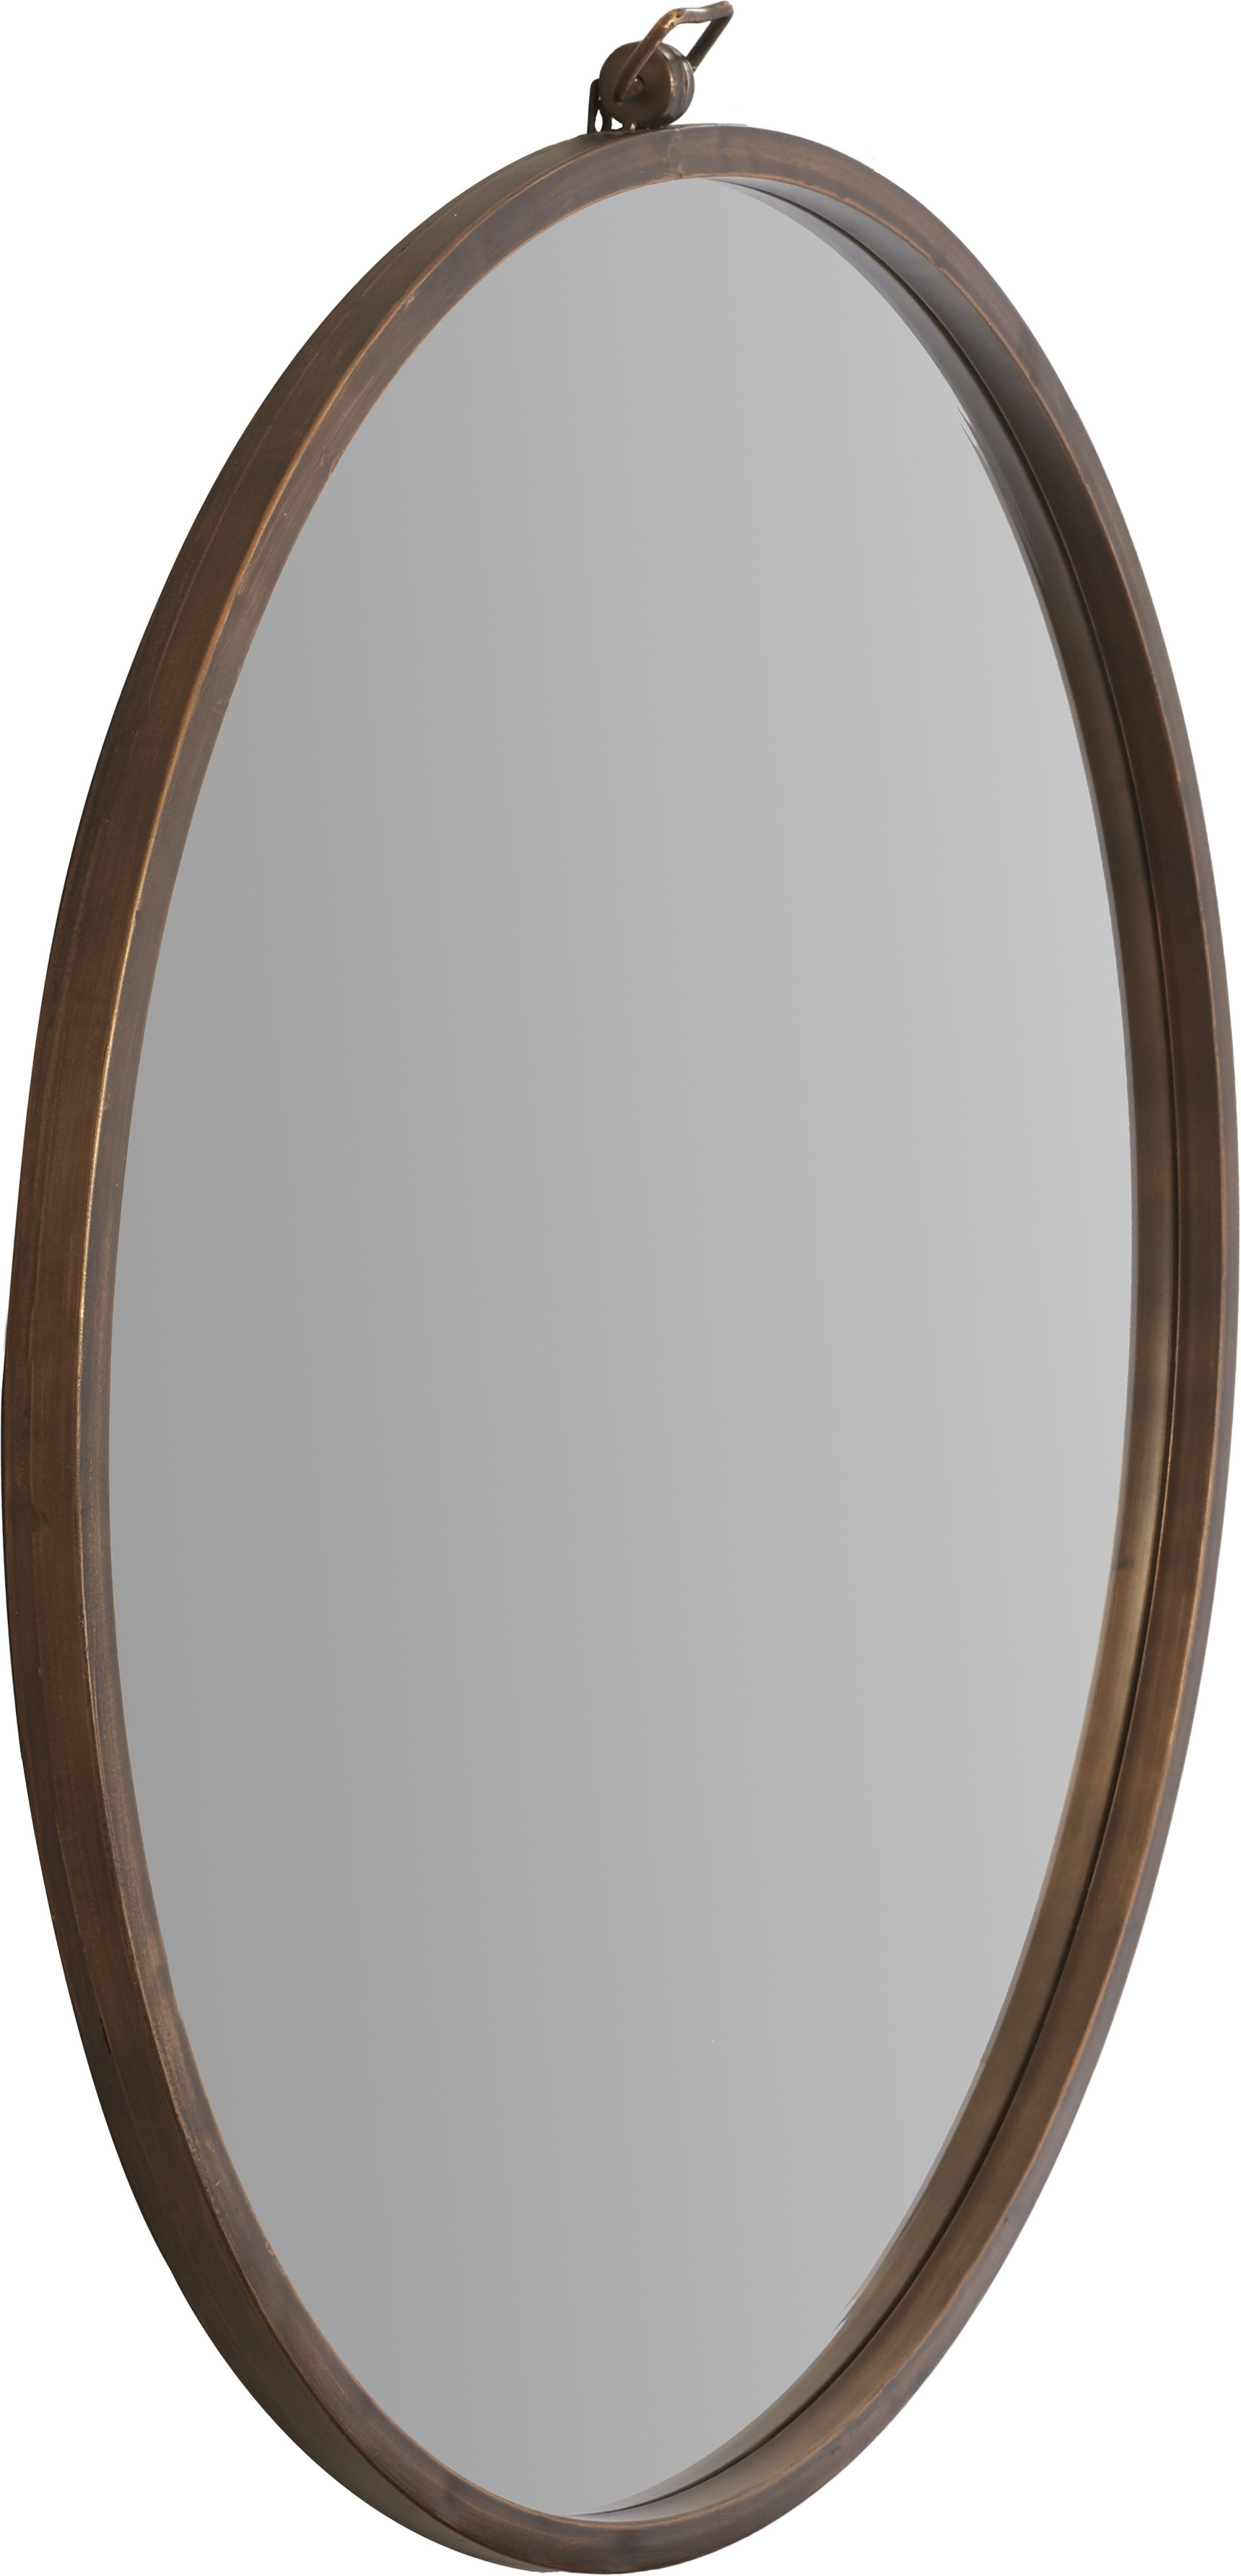 Langley Street Minerva Accent Mirror Regarding Minerva Accent Mirrors (View 4 of 20)